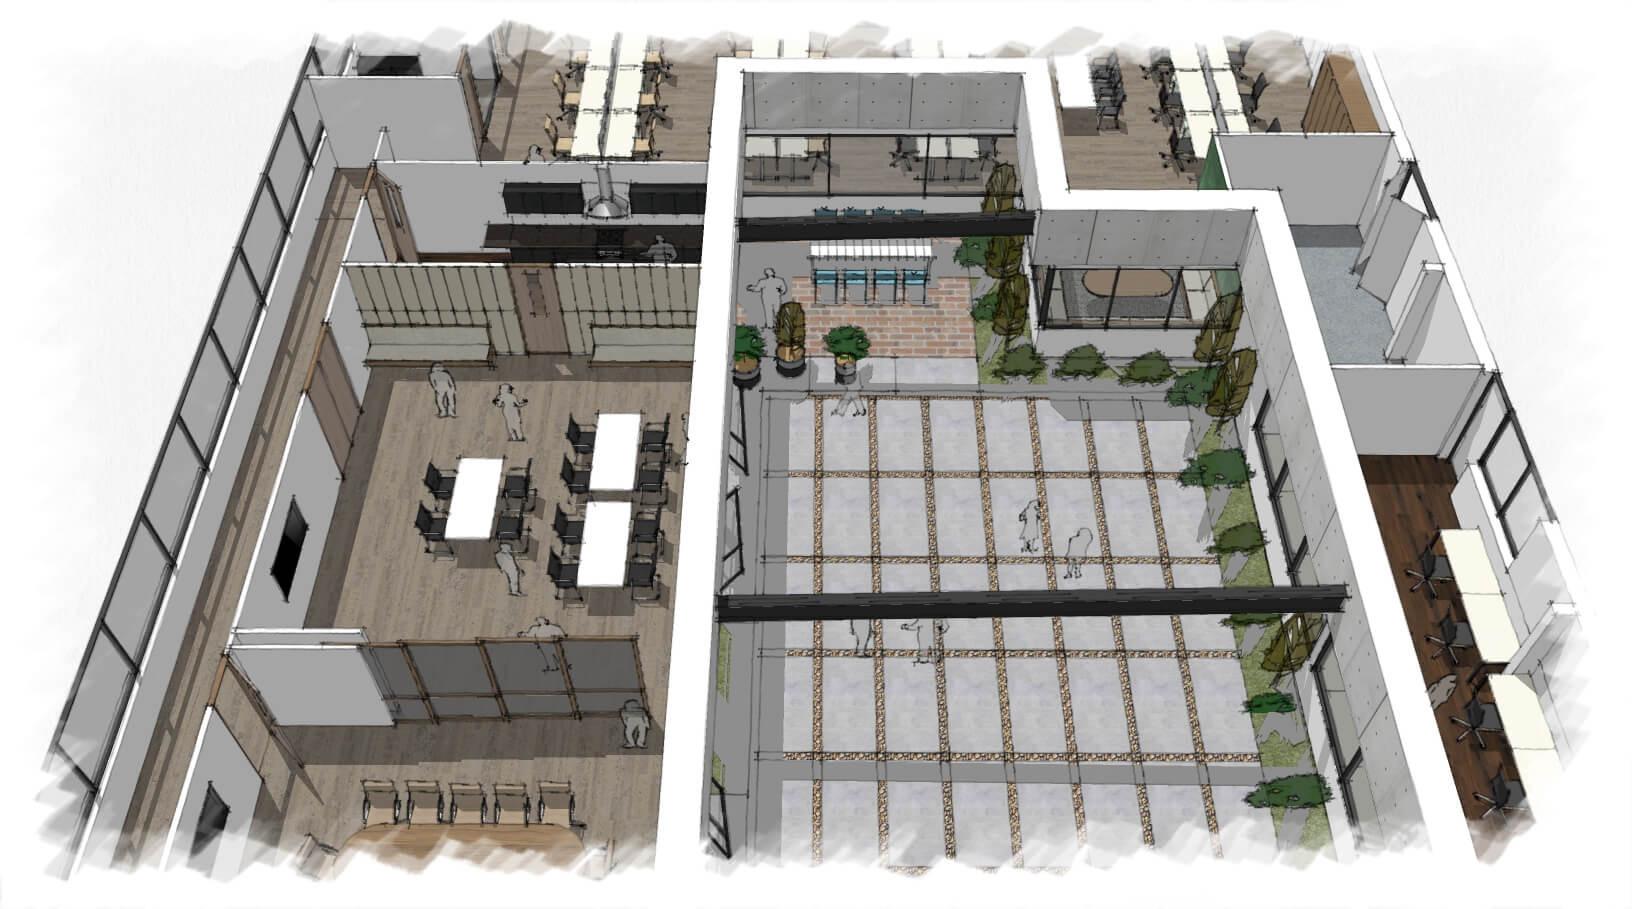 Sealy NSW Bedding Plant - Commercial floor plan designer